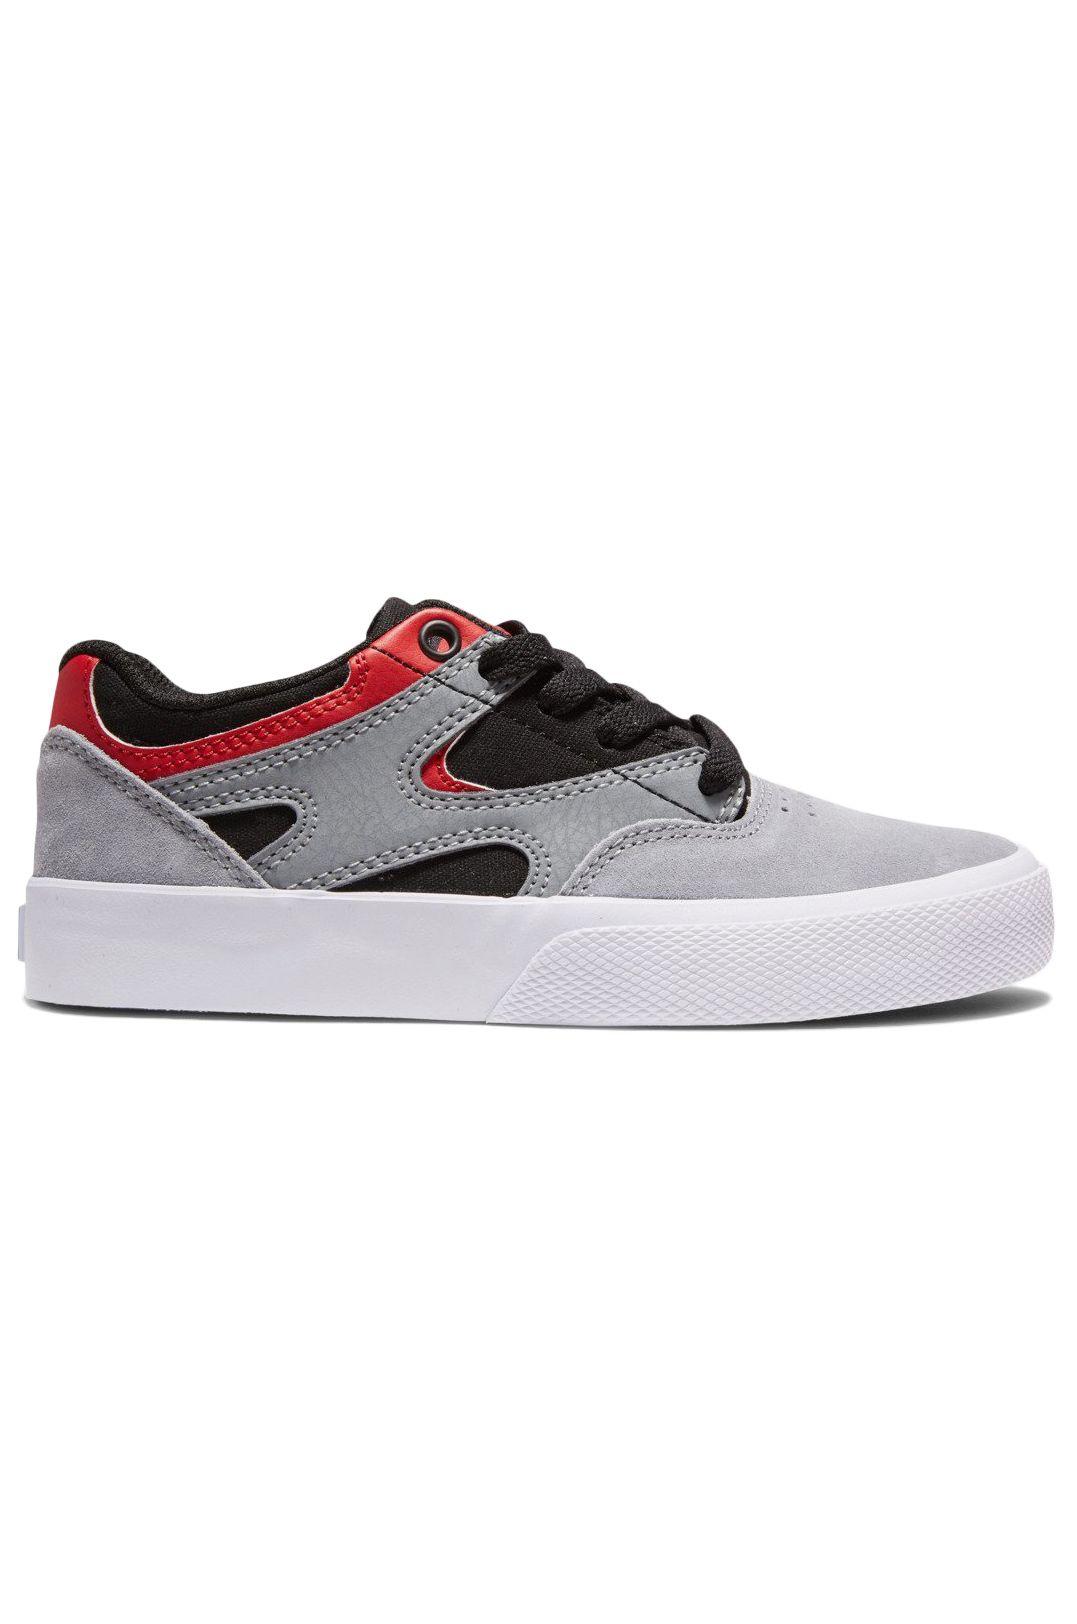 DC Shoes Shoes KALIS VULC Black/Grey/Red